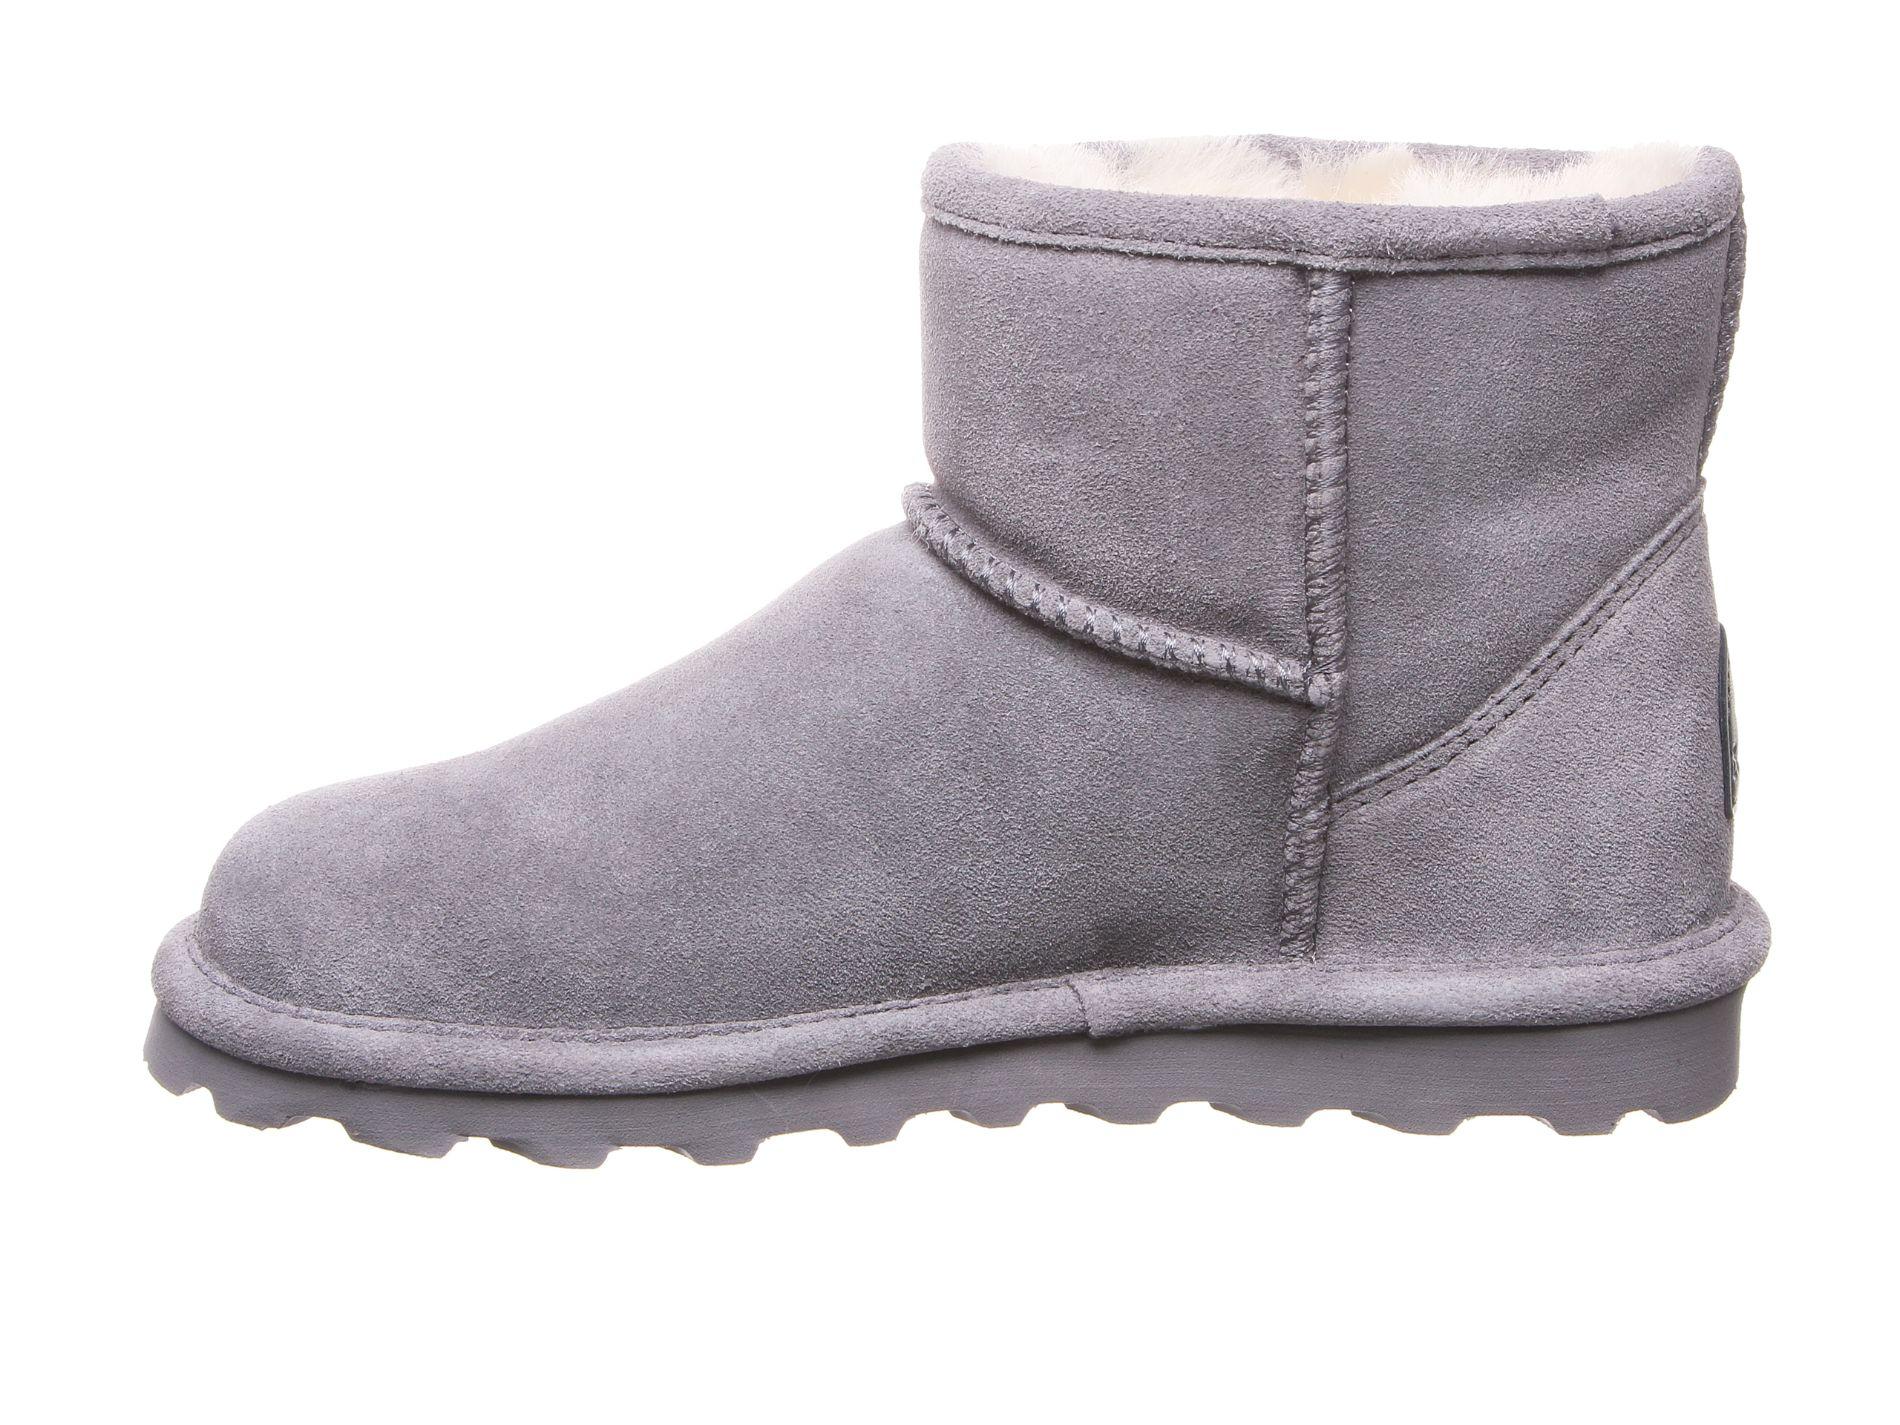 Alyssa Bearpaw Official Store Alyssa Bearpaw Boots Shoes